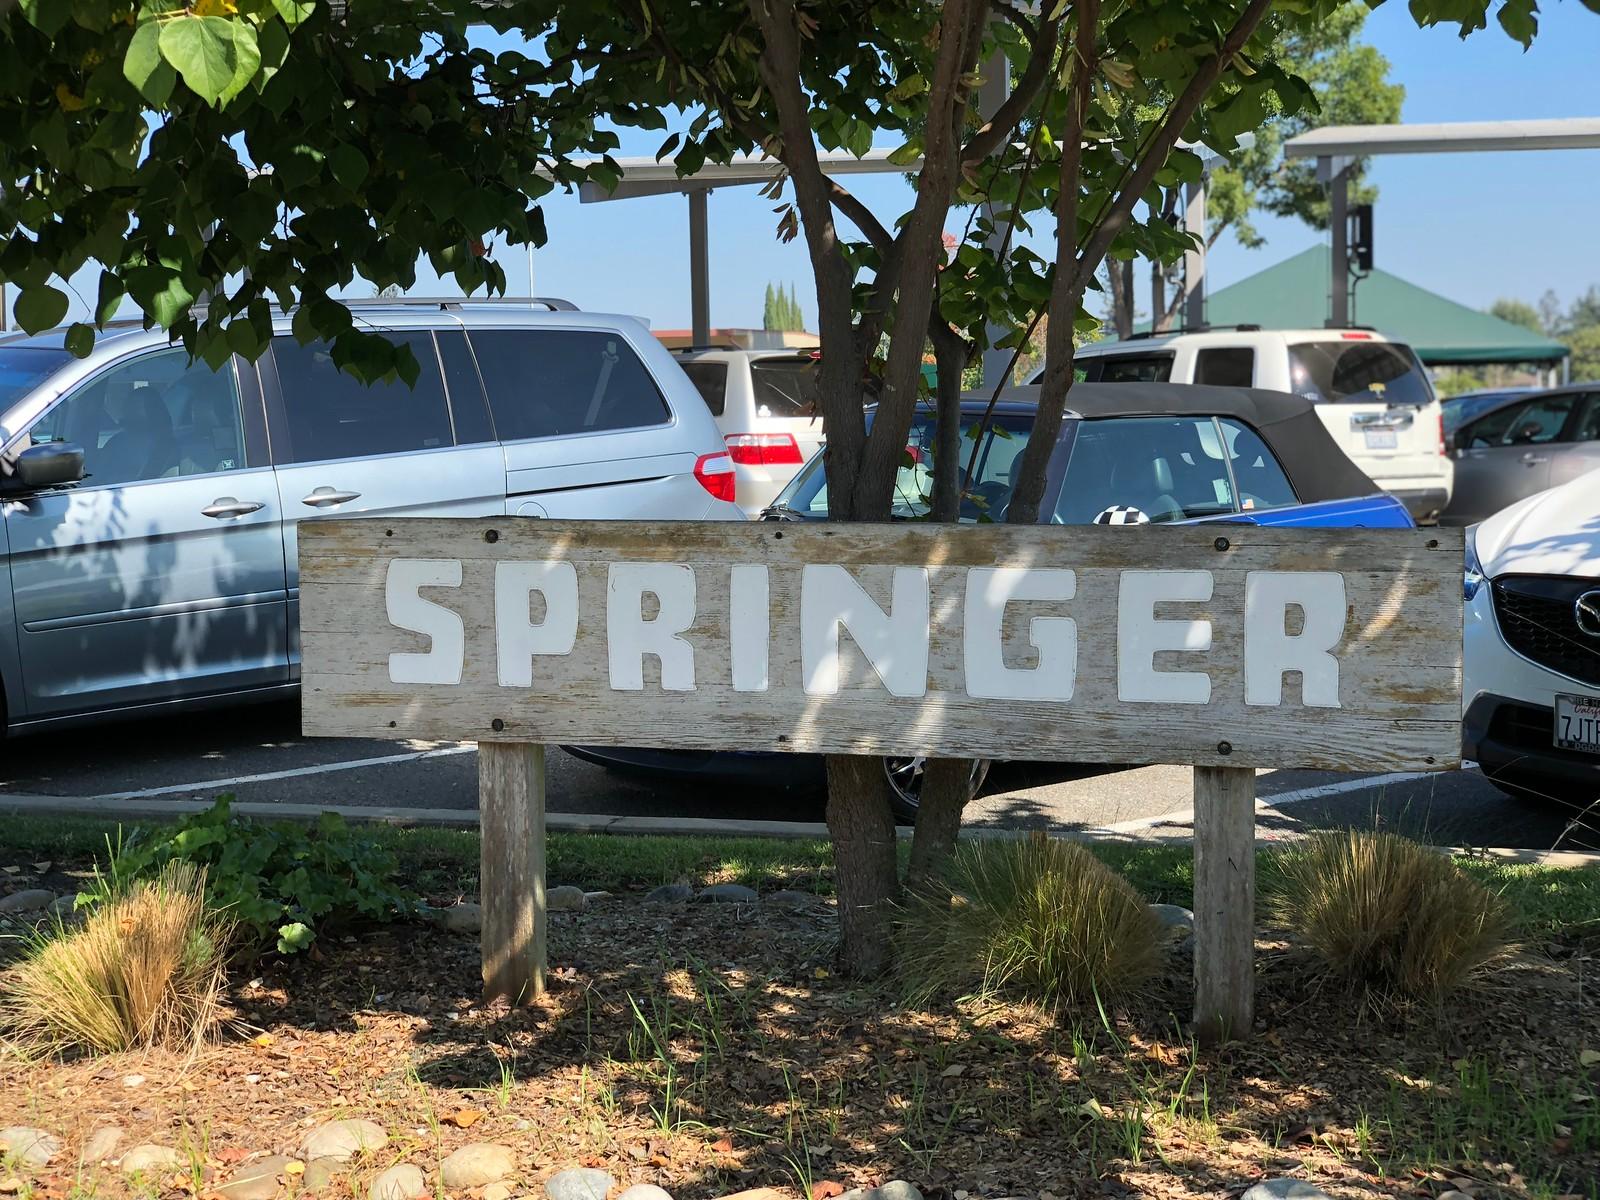 Springer Elementary School Sign Mountain View Blu Skye Media-X3.jpg